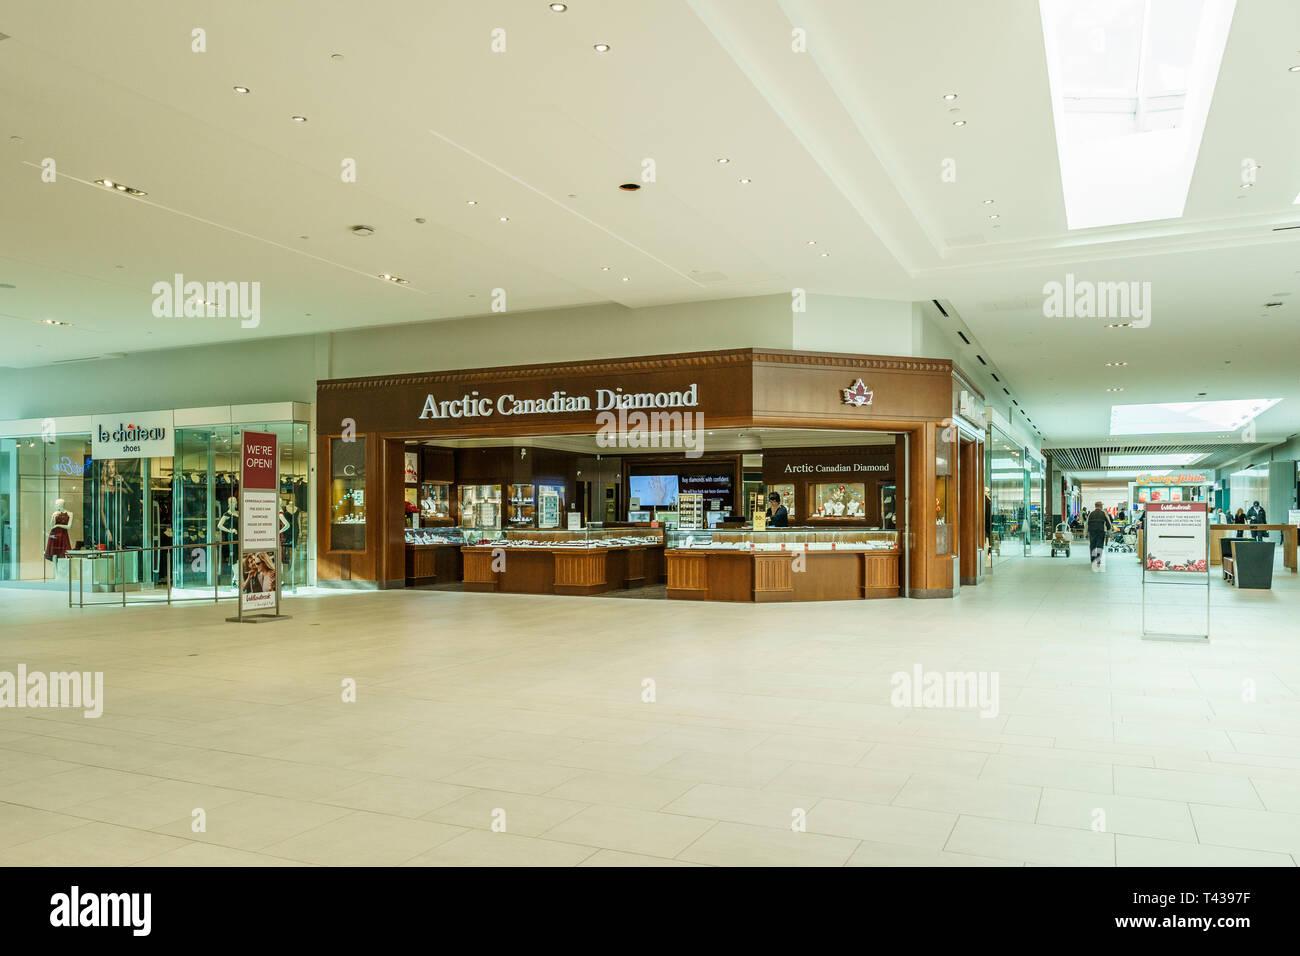 Langley, CANADA - November 14, 2018: interior view of Willowbrook Shopping Centre. - Stock Image